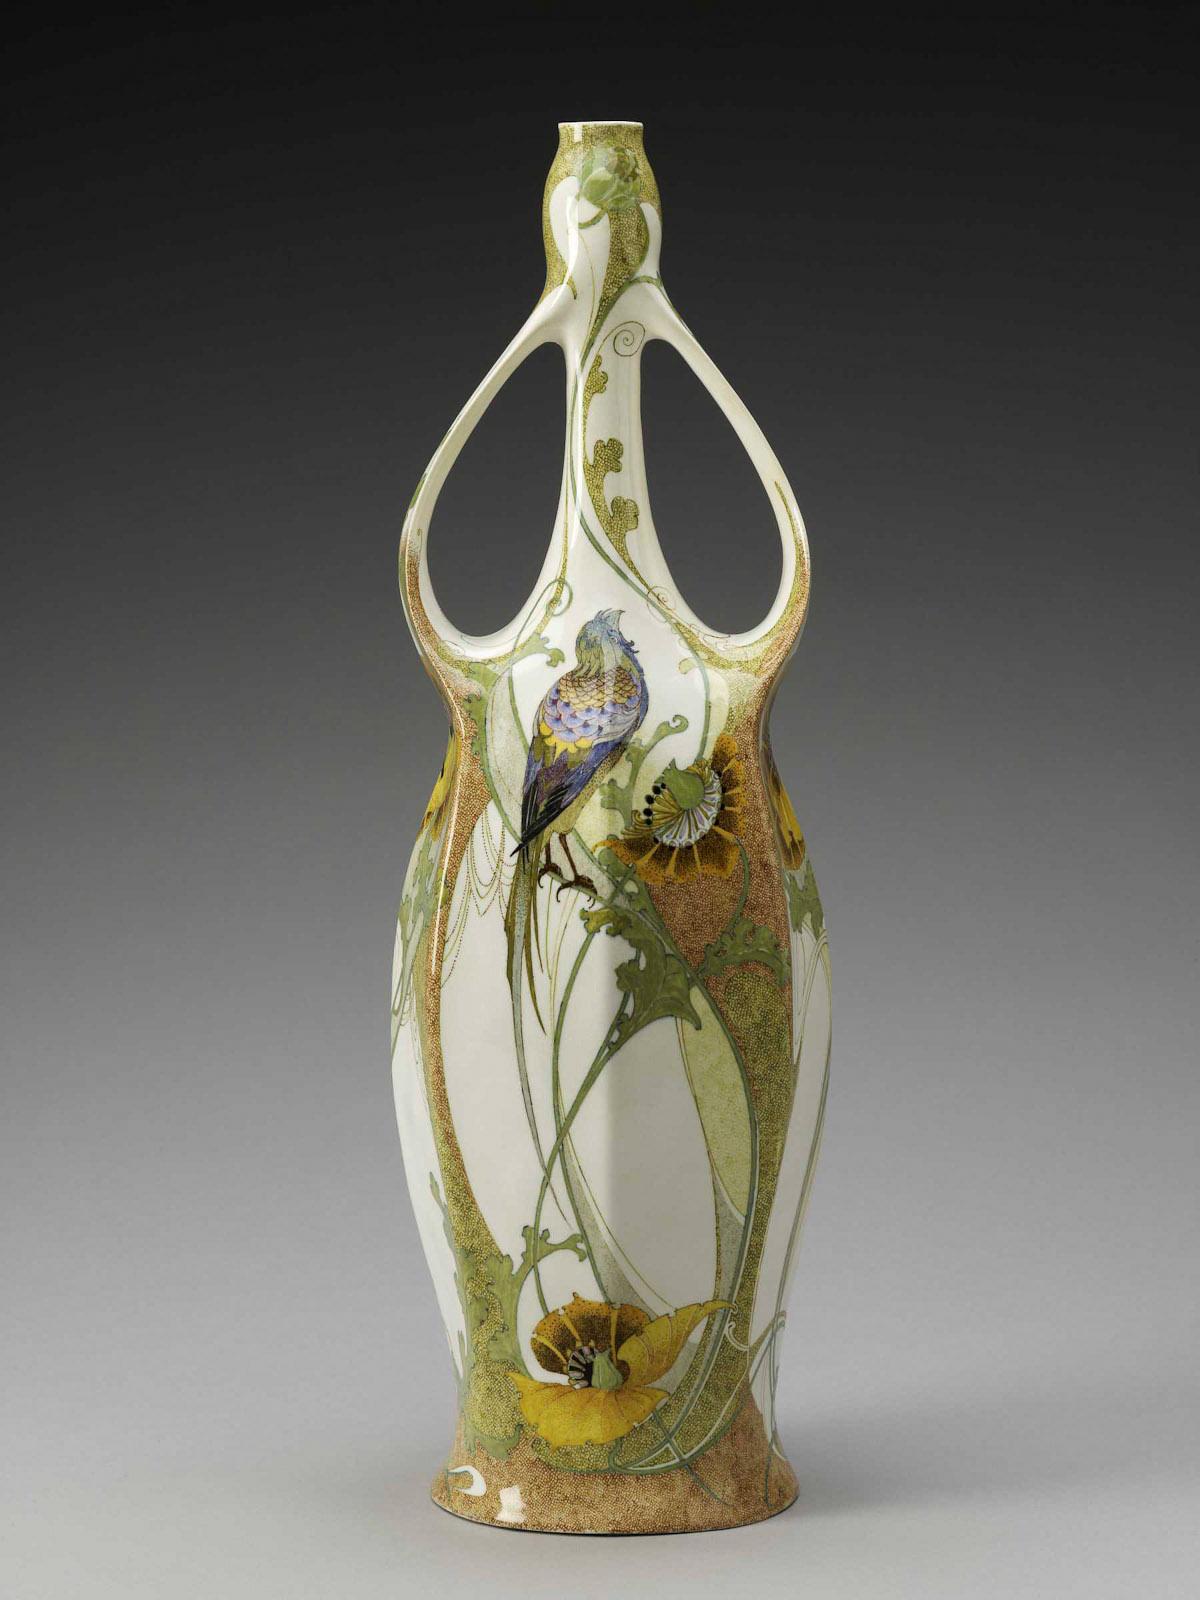 News_Leslie_Circa 1900_Rozenburg_Vase